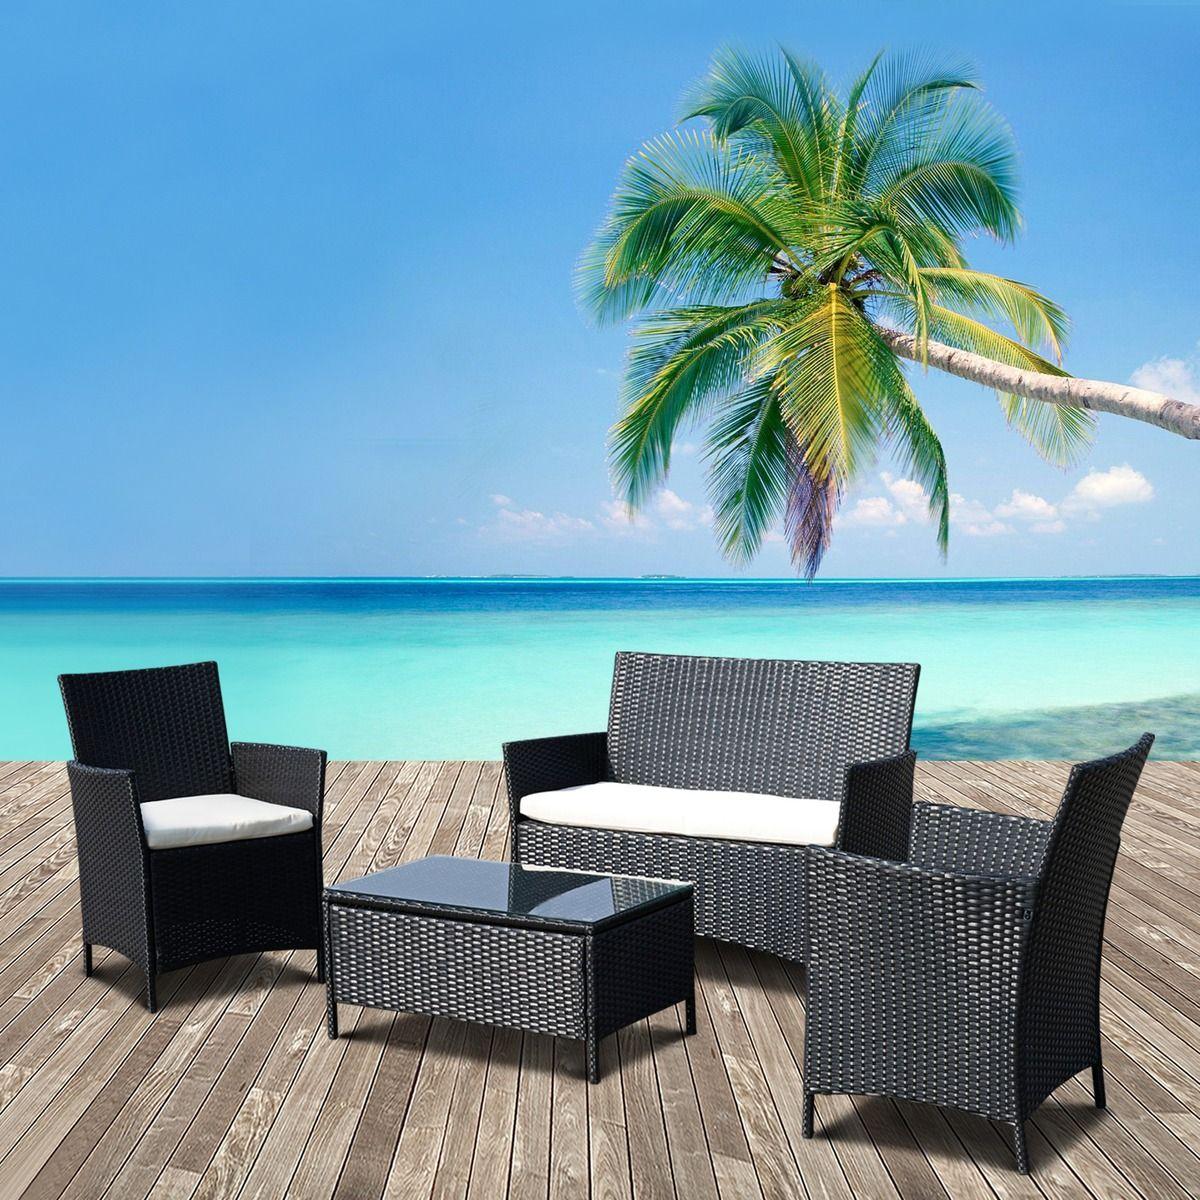 petits budgets un salon de jardin complet moins de 200 decocrush. Black Bedroom Furniture Sets. Home Design Ideas